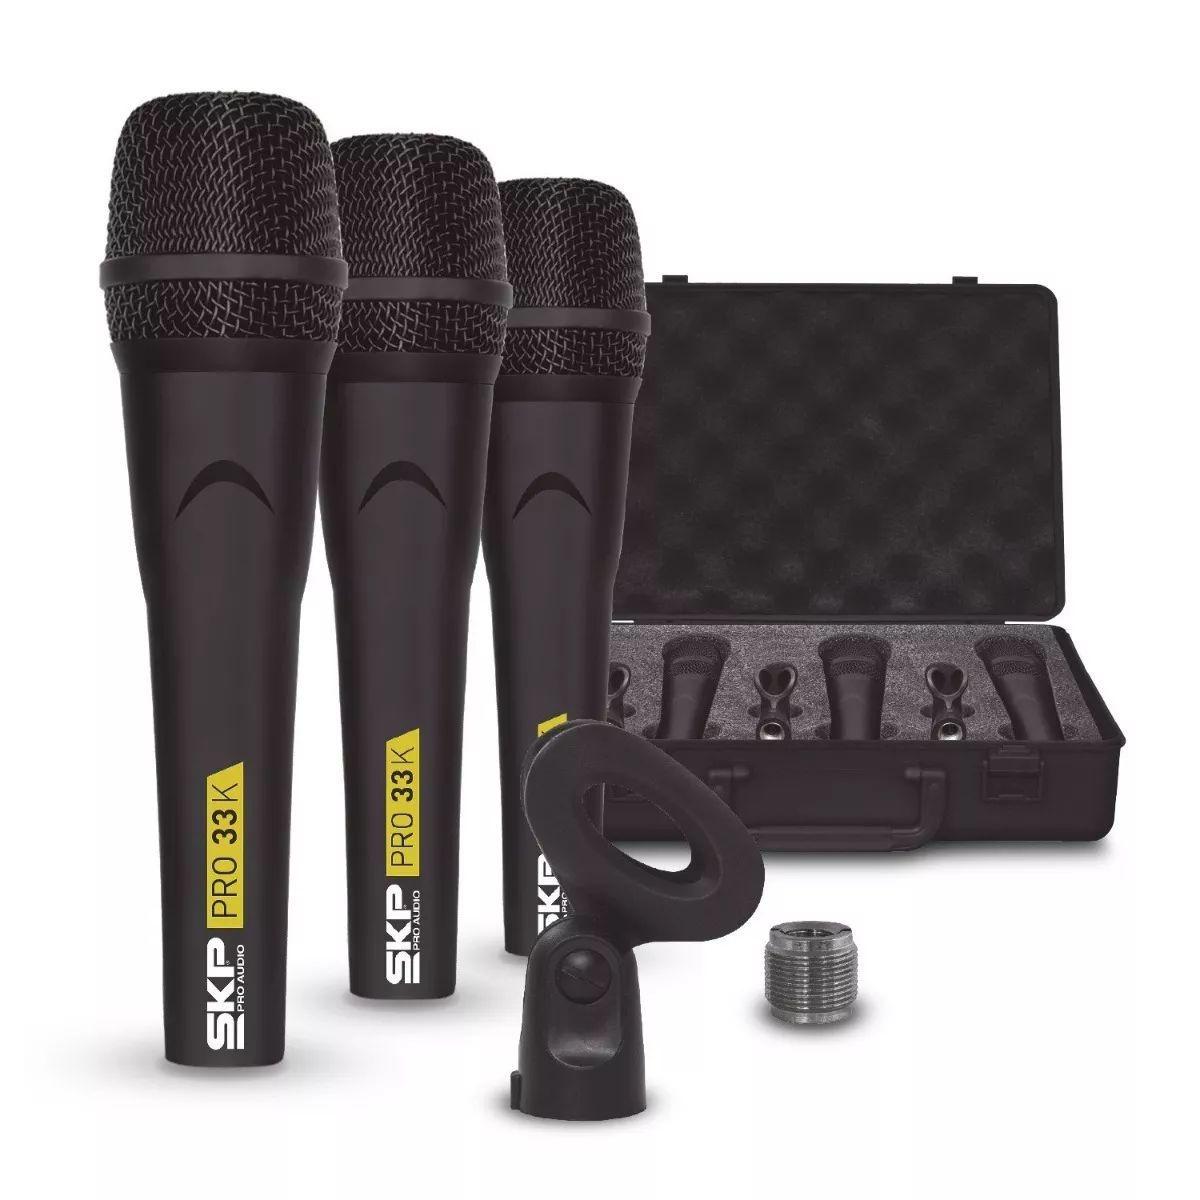 Microfones Kit 3 Profissional Skp Pro 33k Dinâmico C/ Case